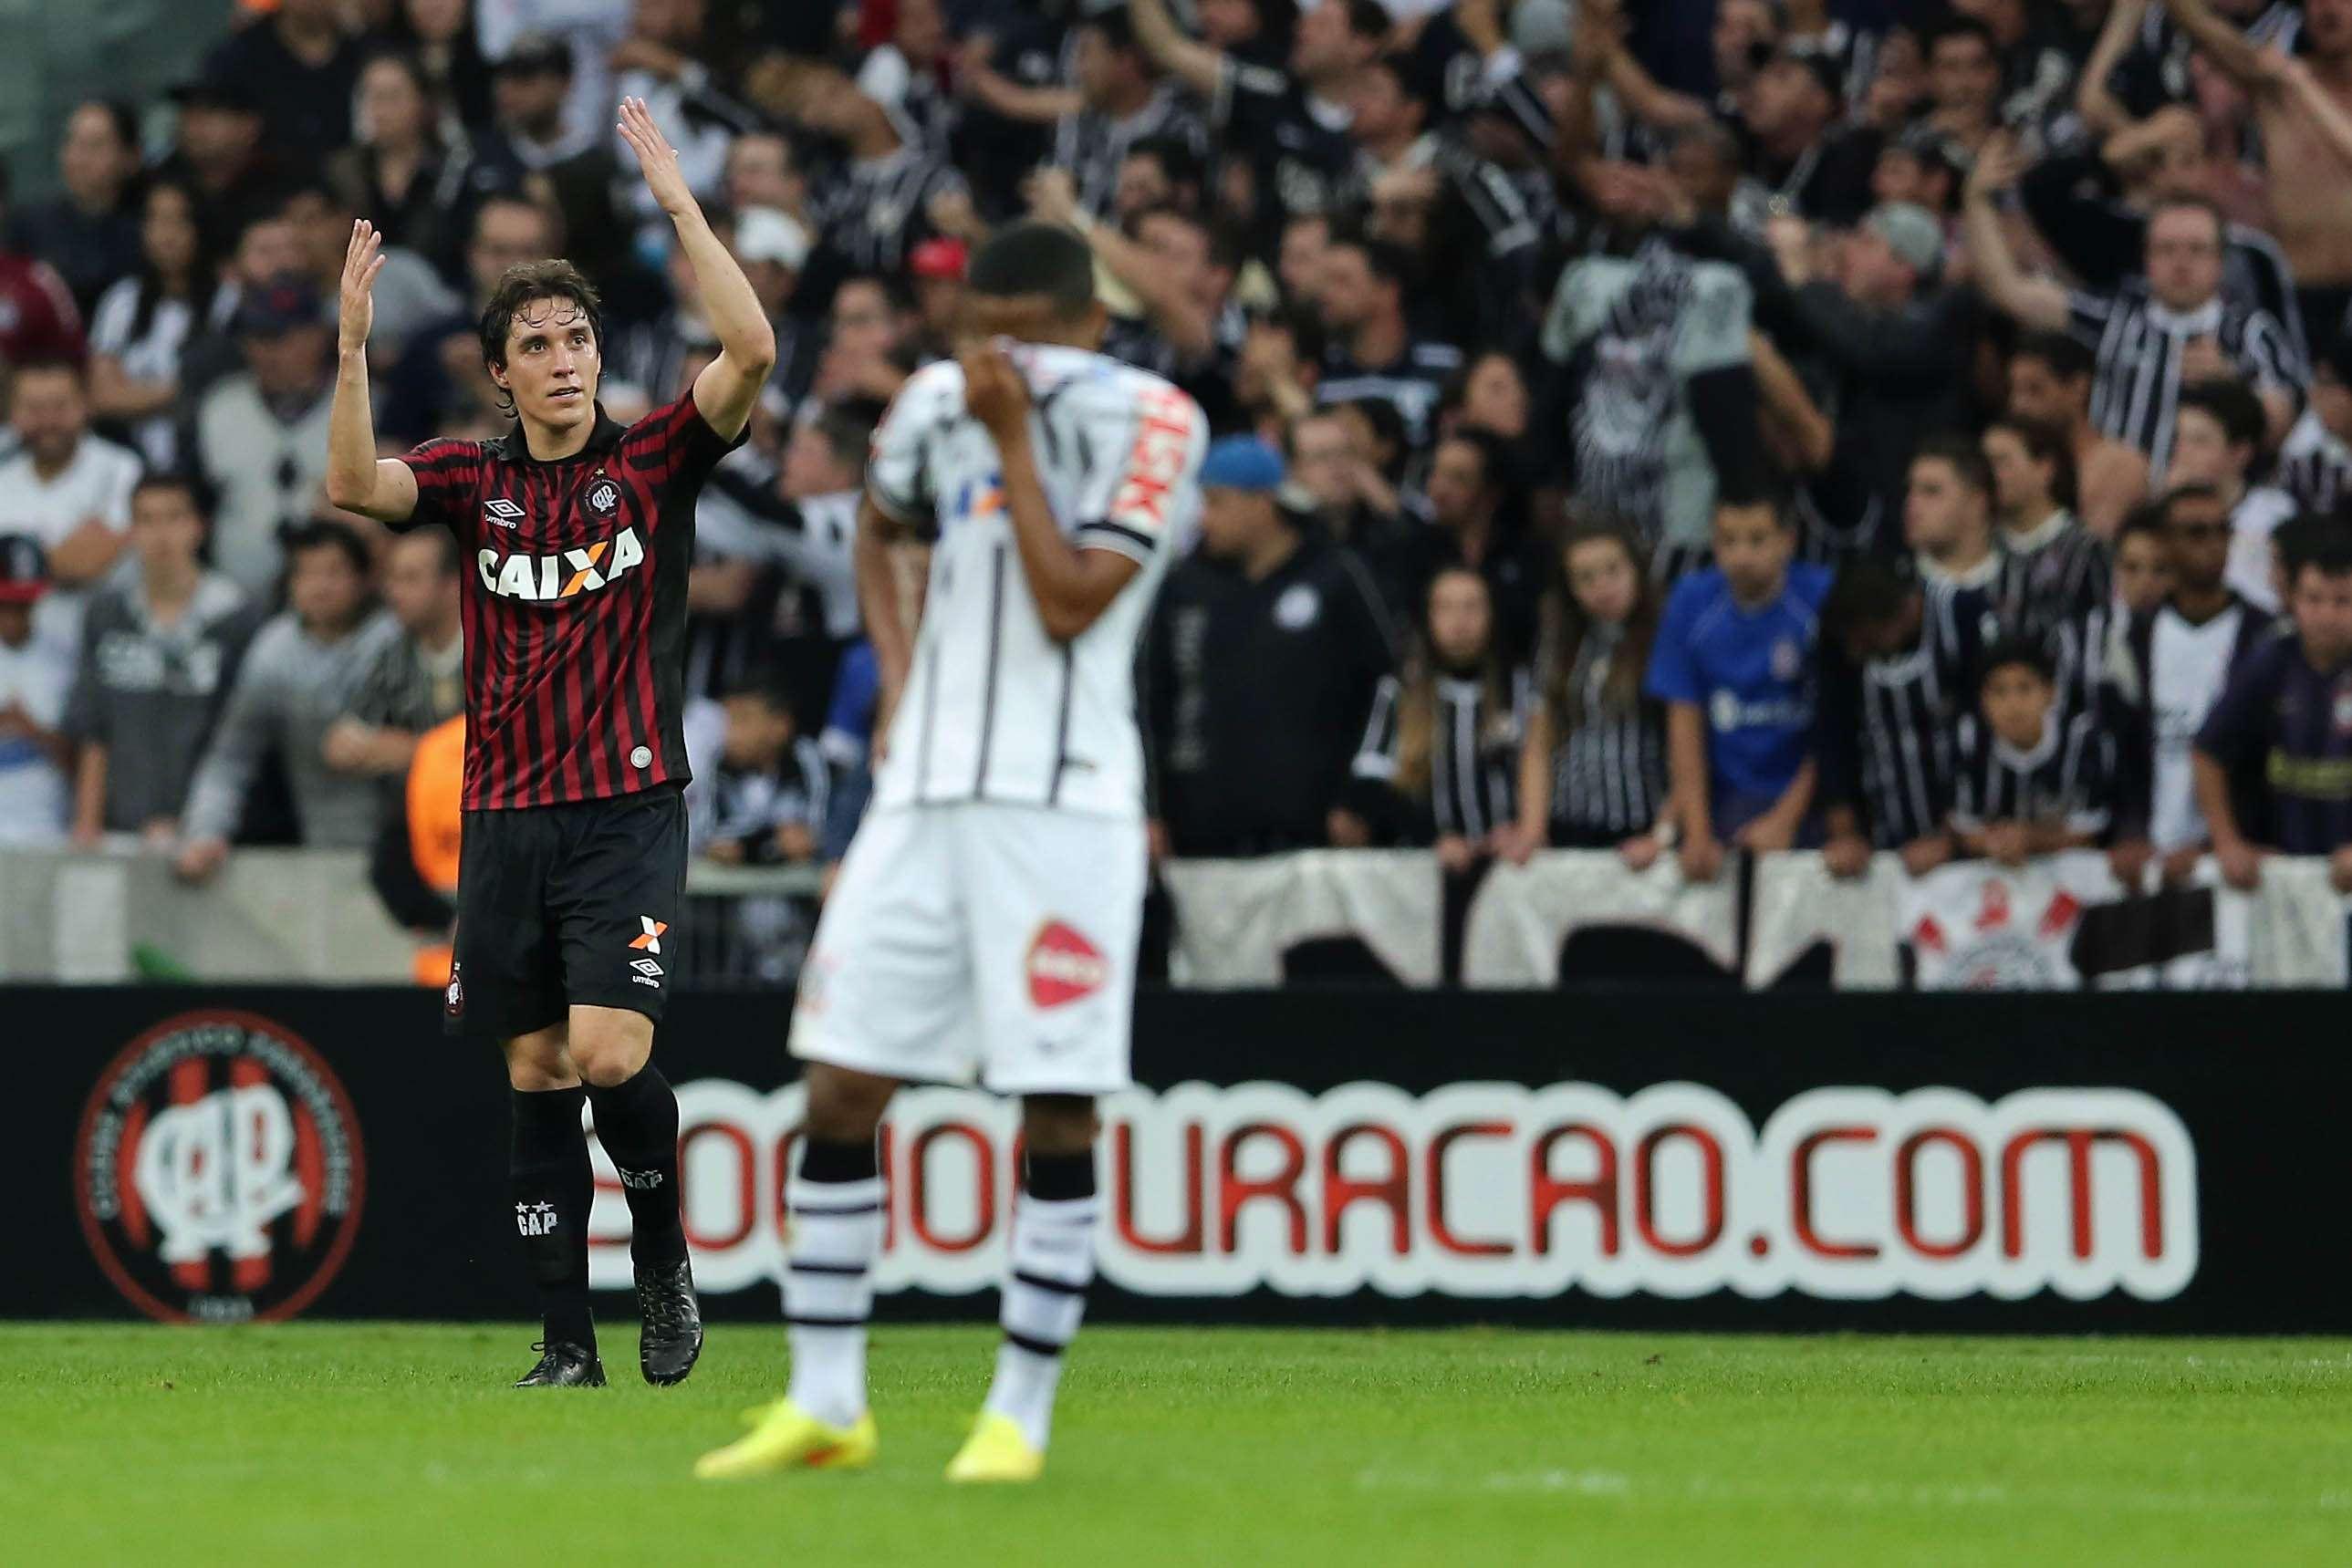 Cléo festeja gol anotado Foto: Heuler Andrey/Getty Images